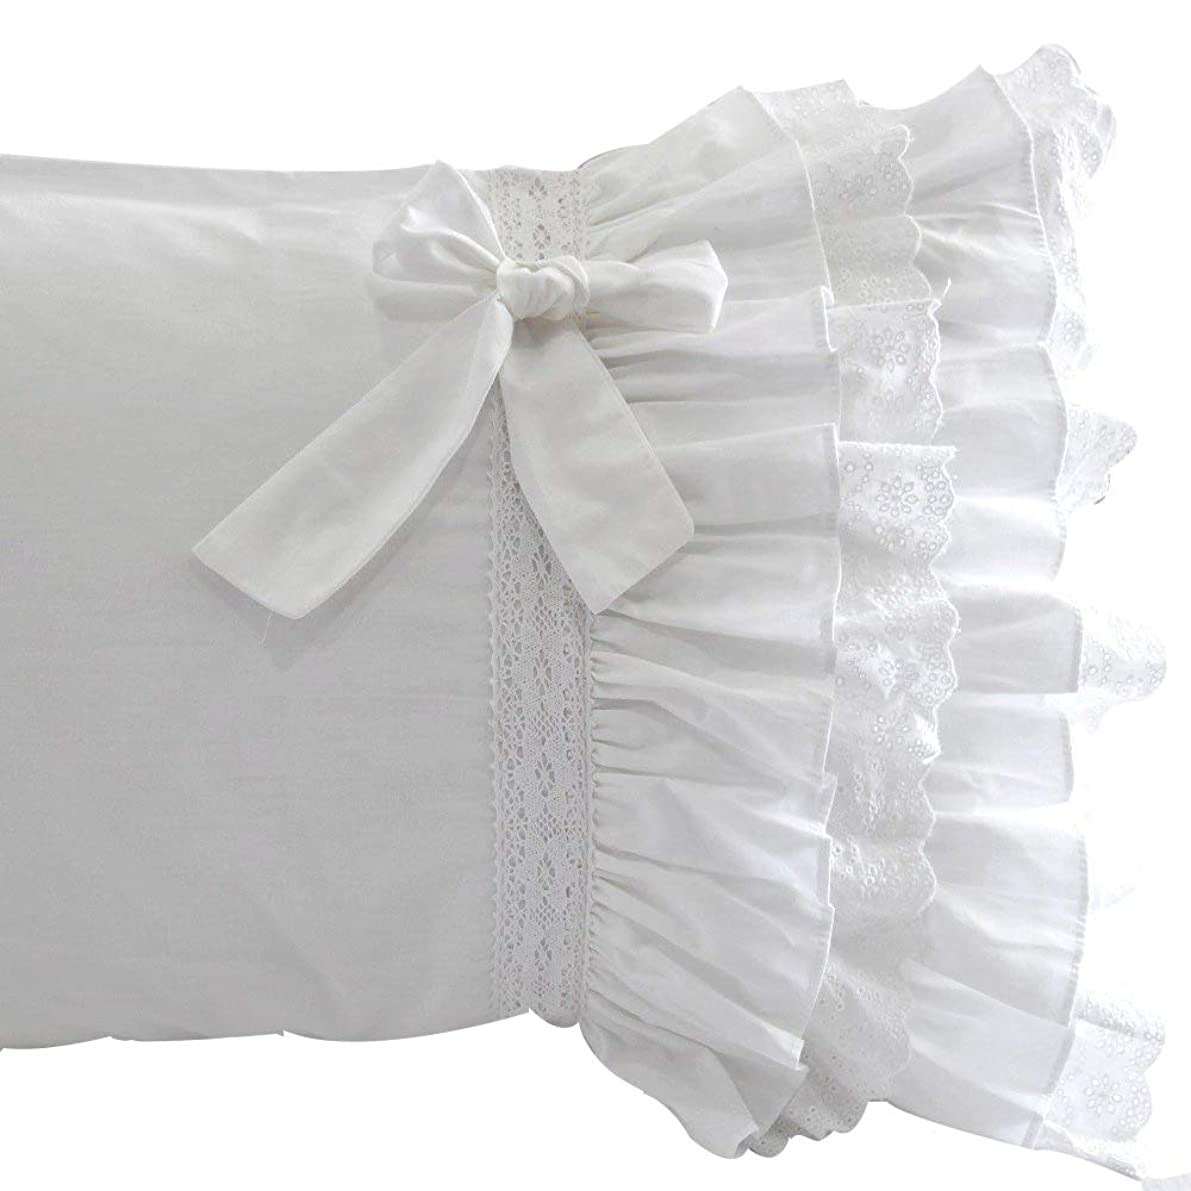 Queen's House Pillow Covers White Pillowcases Set of 2-Queen,E